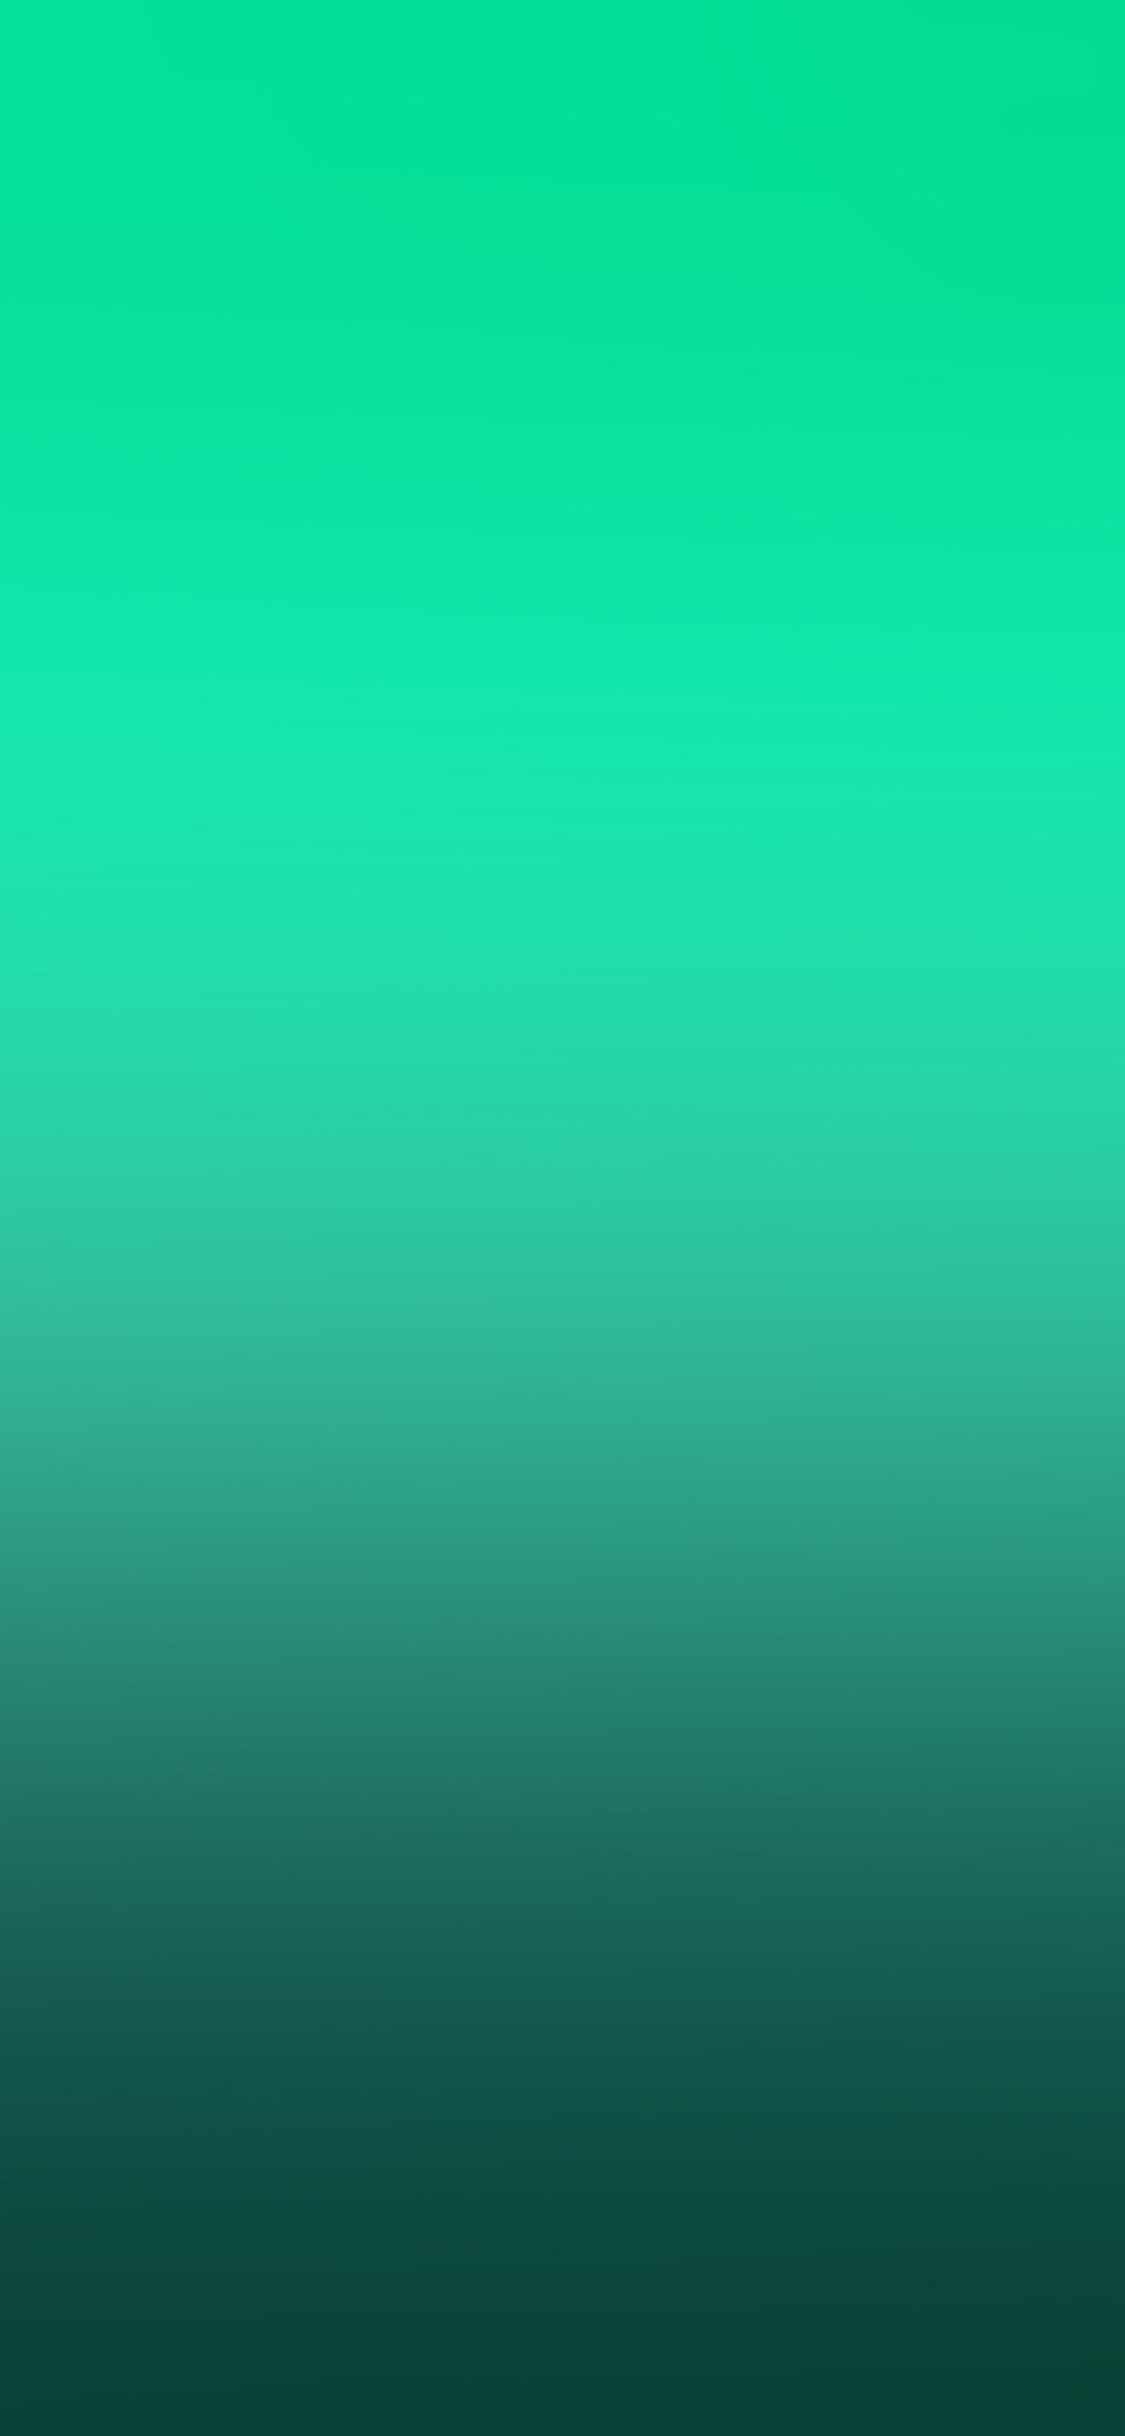 iPhoneXpapers.com-Apple-iPhone-wallpaper-sa85-wallpaper-iphone6-green-blur